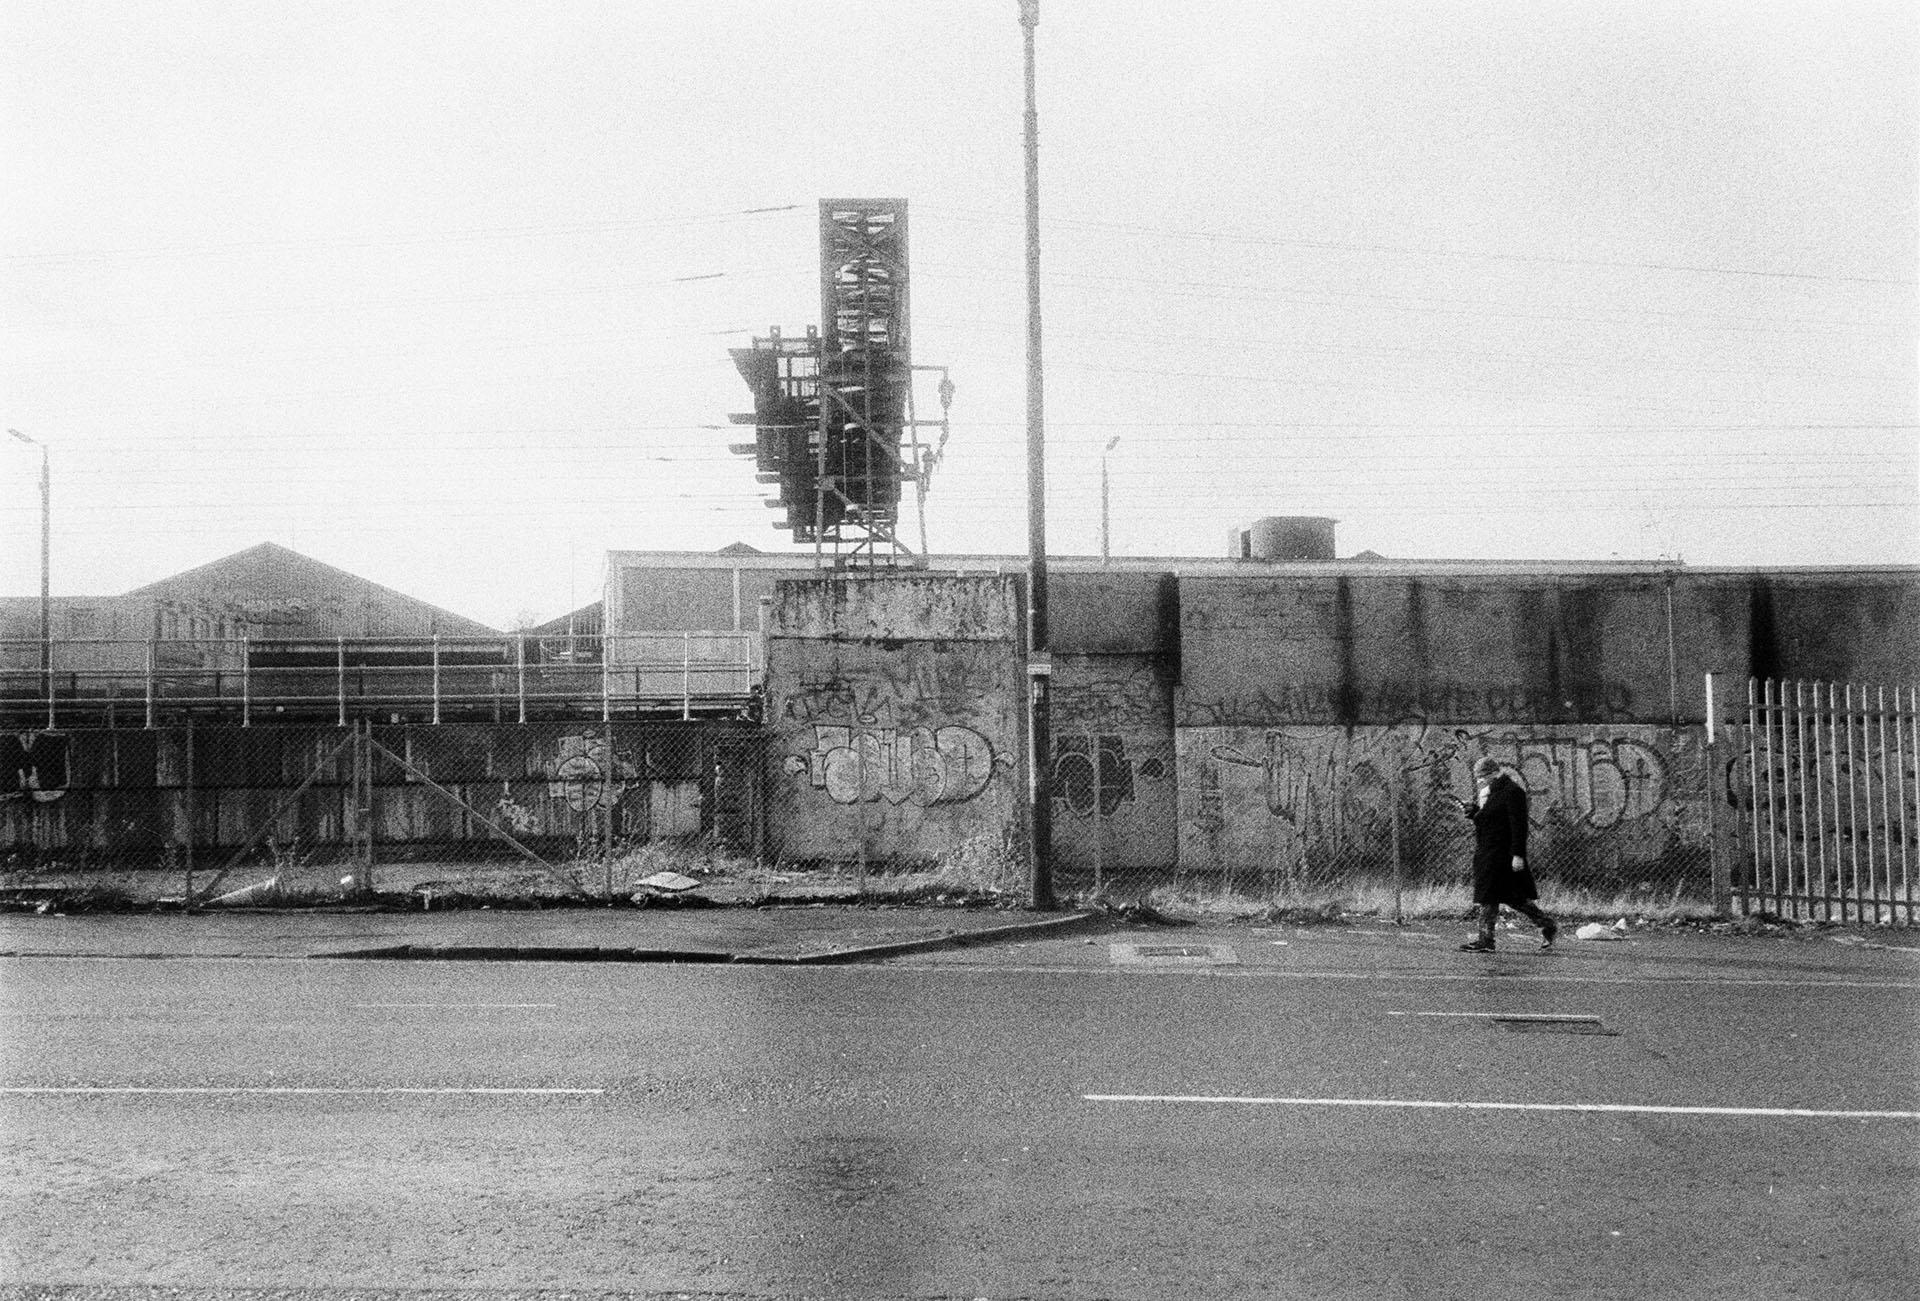 35mm street photography